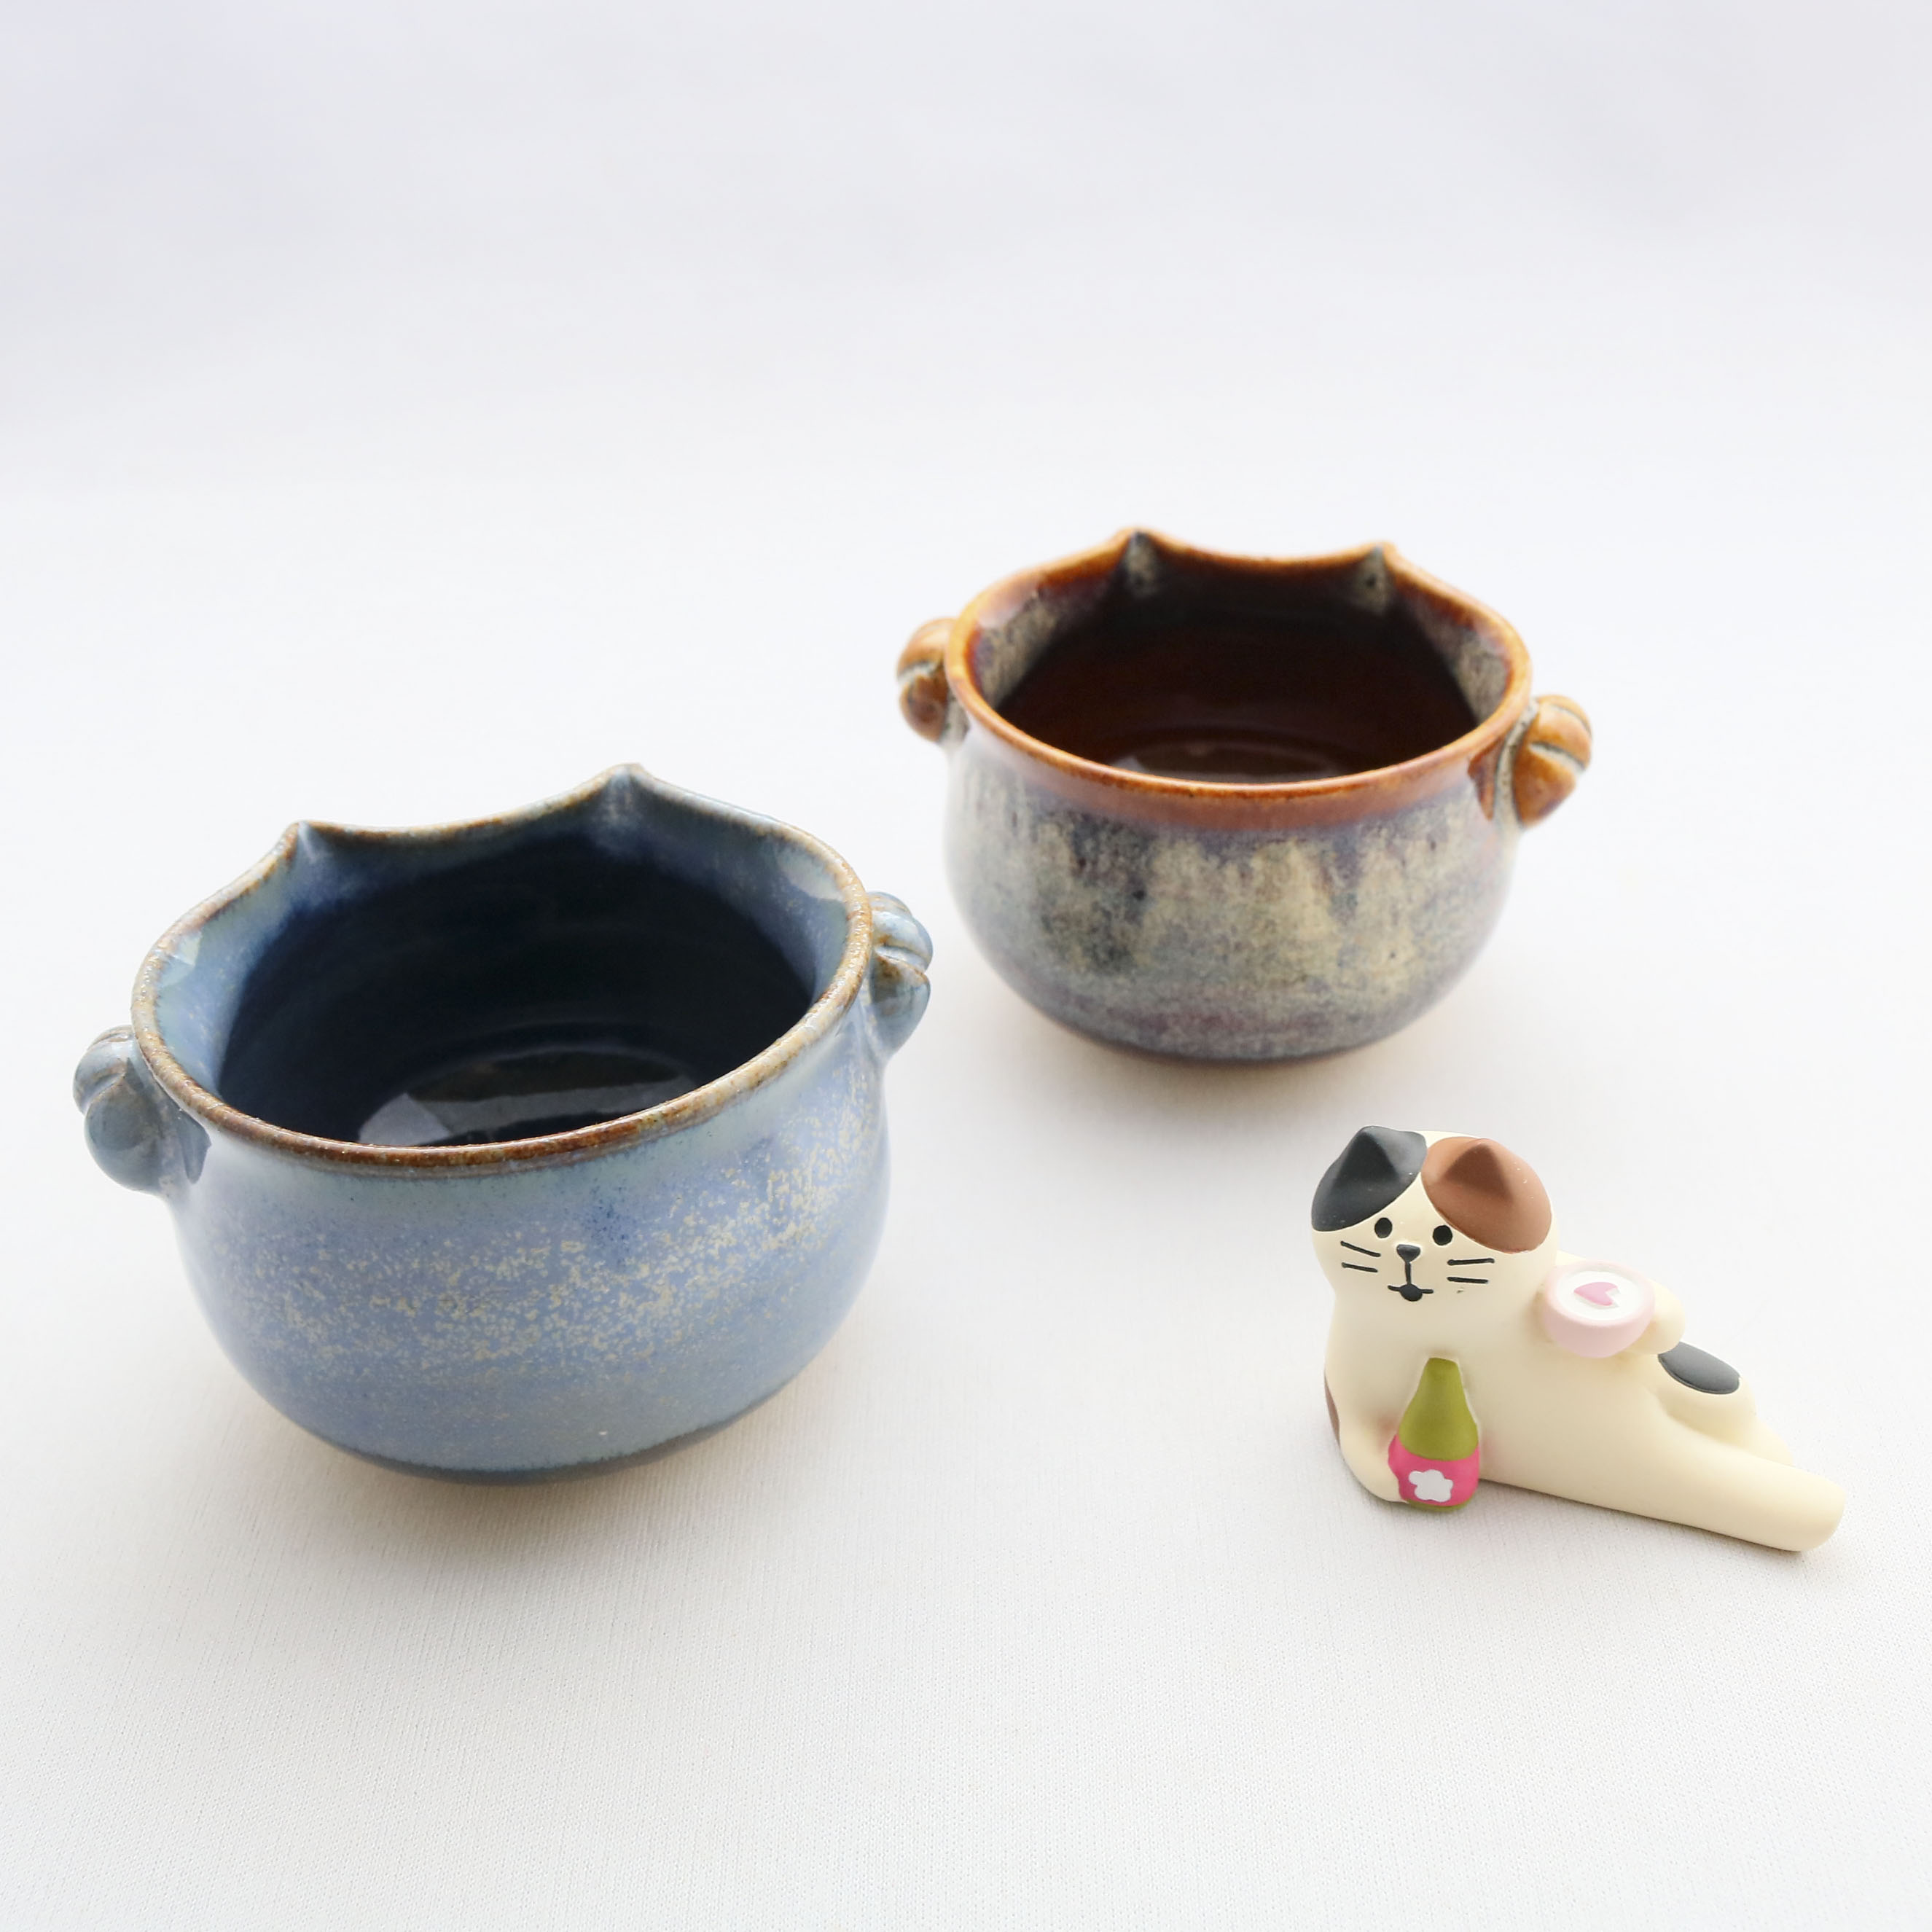 kijn 猫雑貨 猫グッズ ぐいのみ 酒器 陶芸 器 秋田 かぎしっぽ